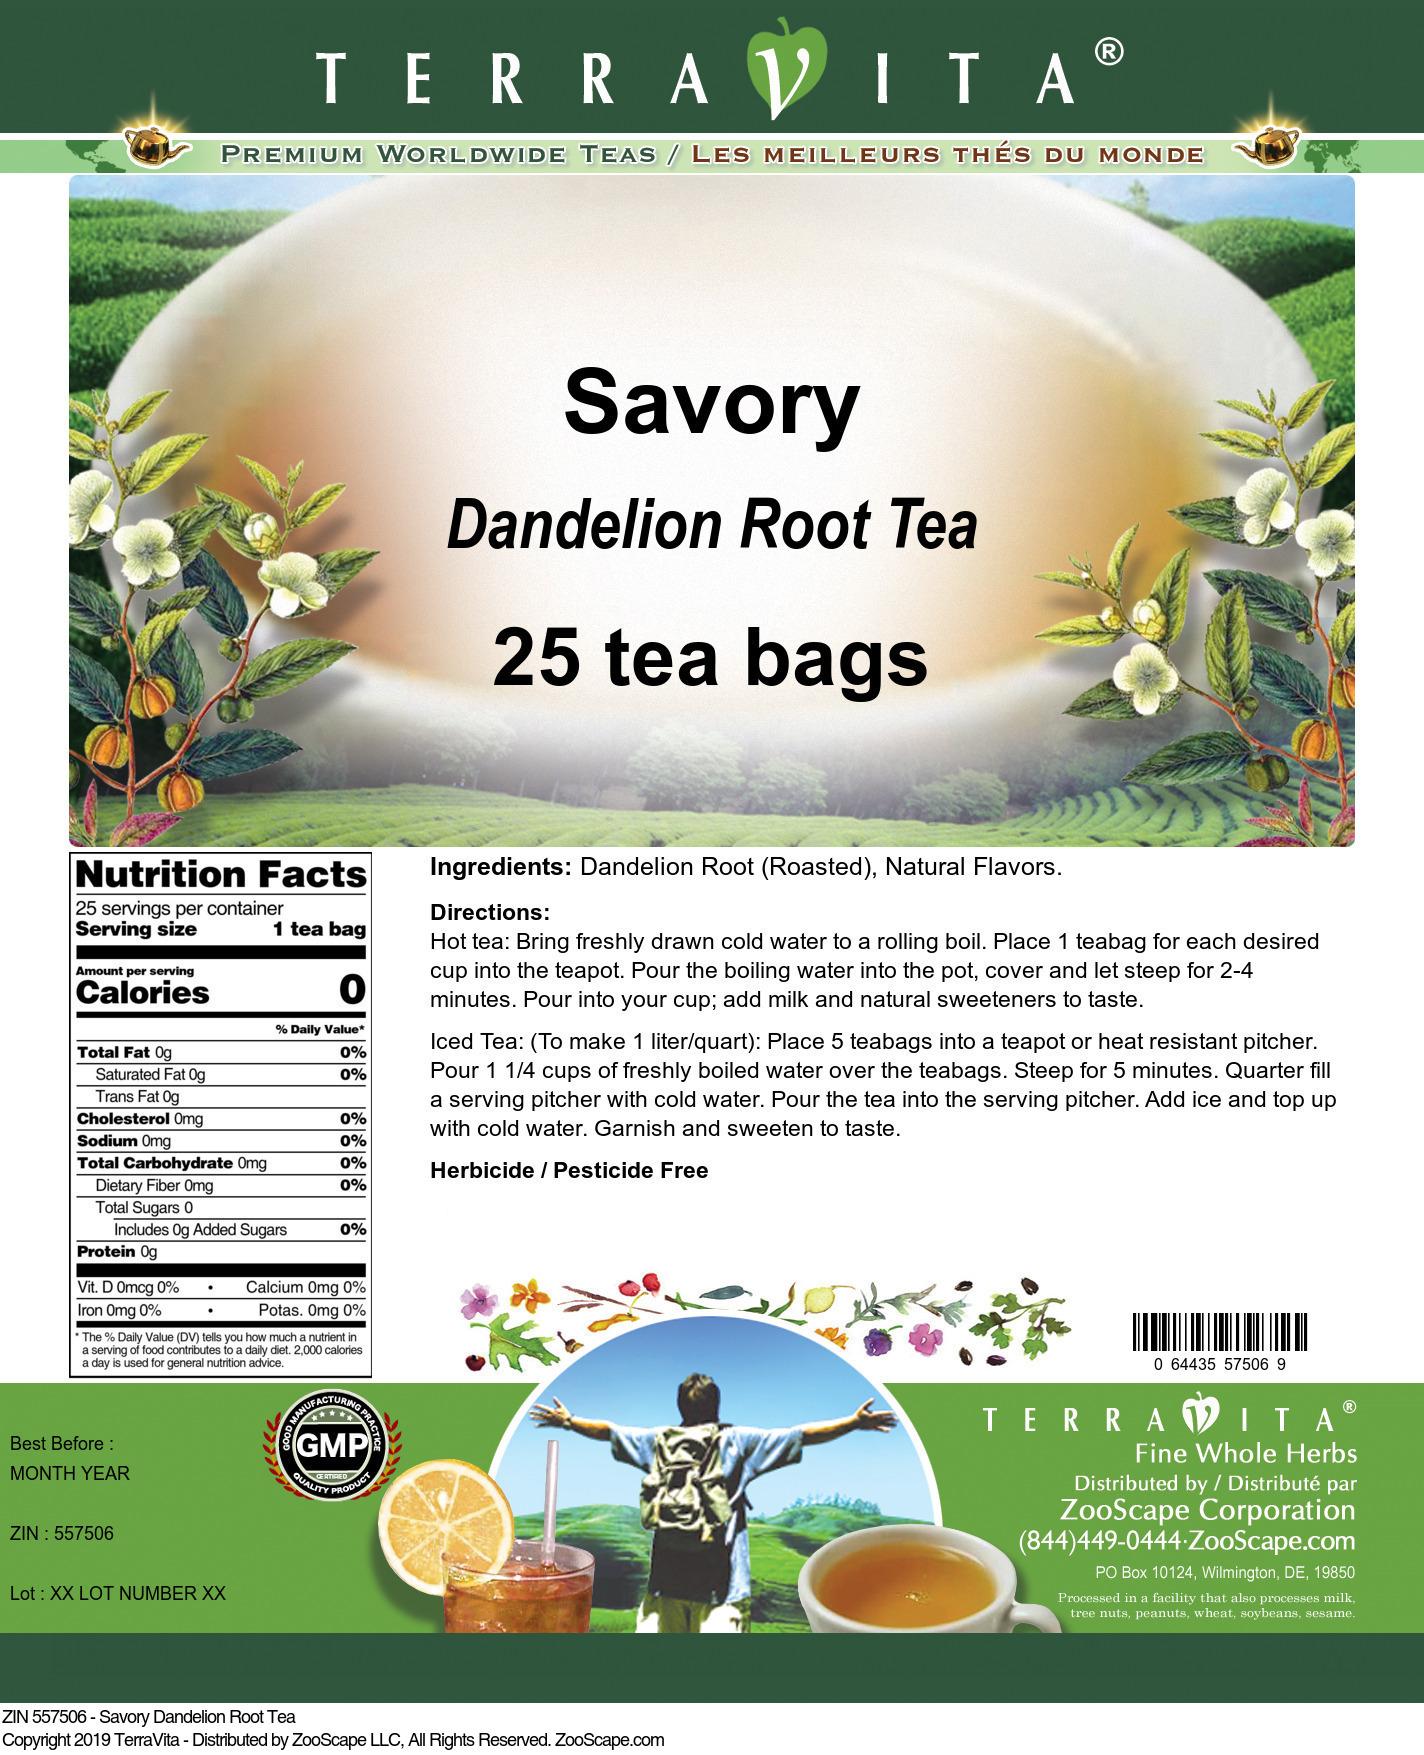 Savory Dandelion Root Tea